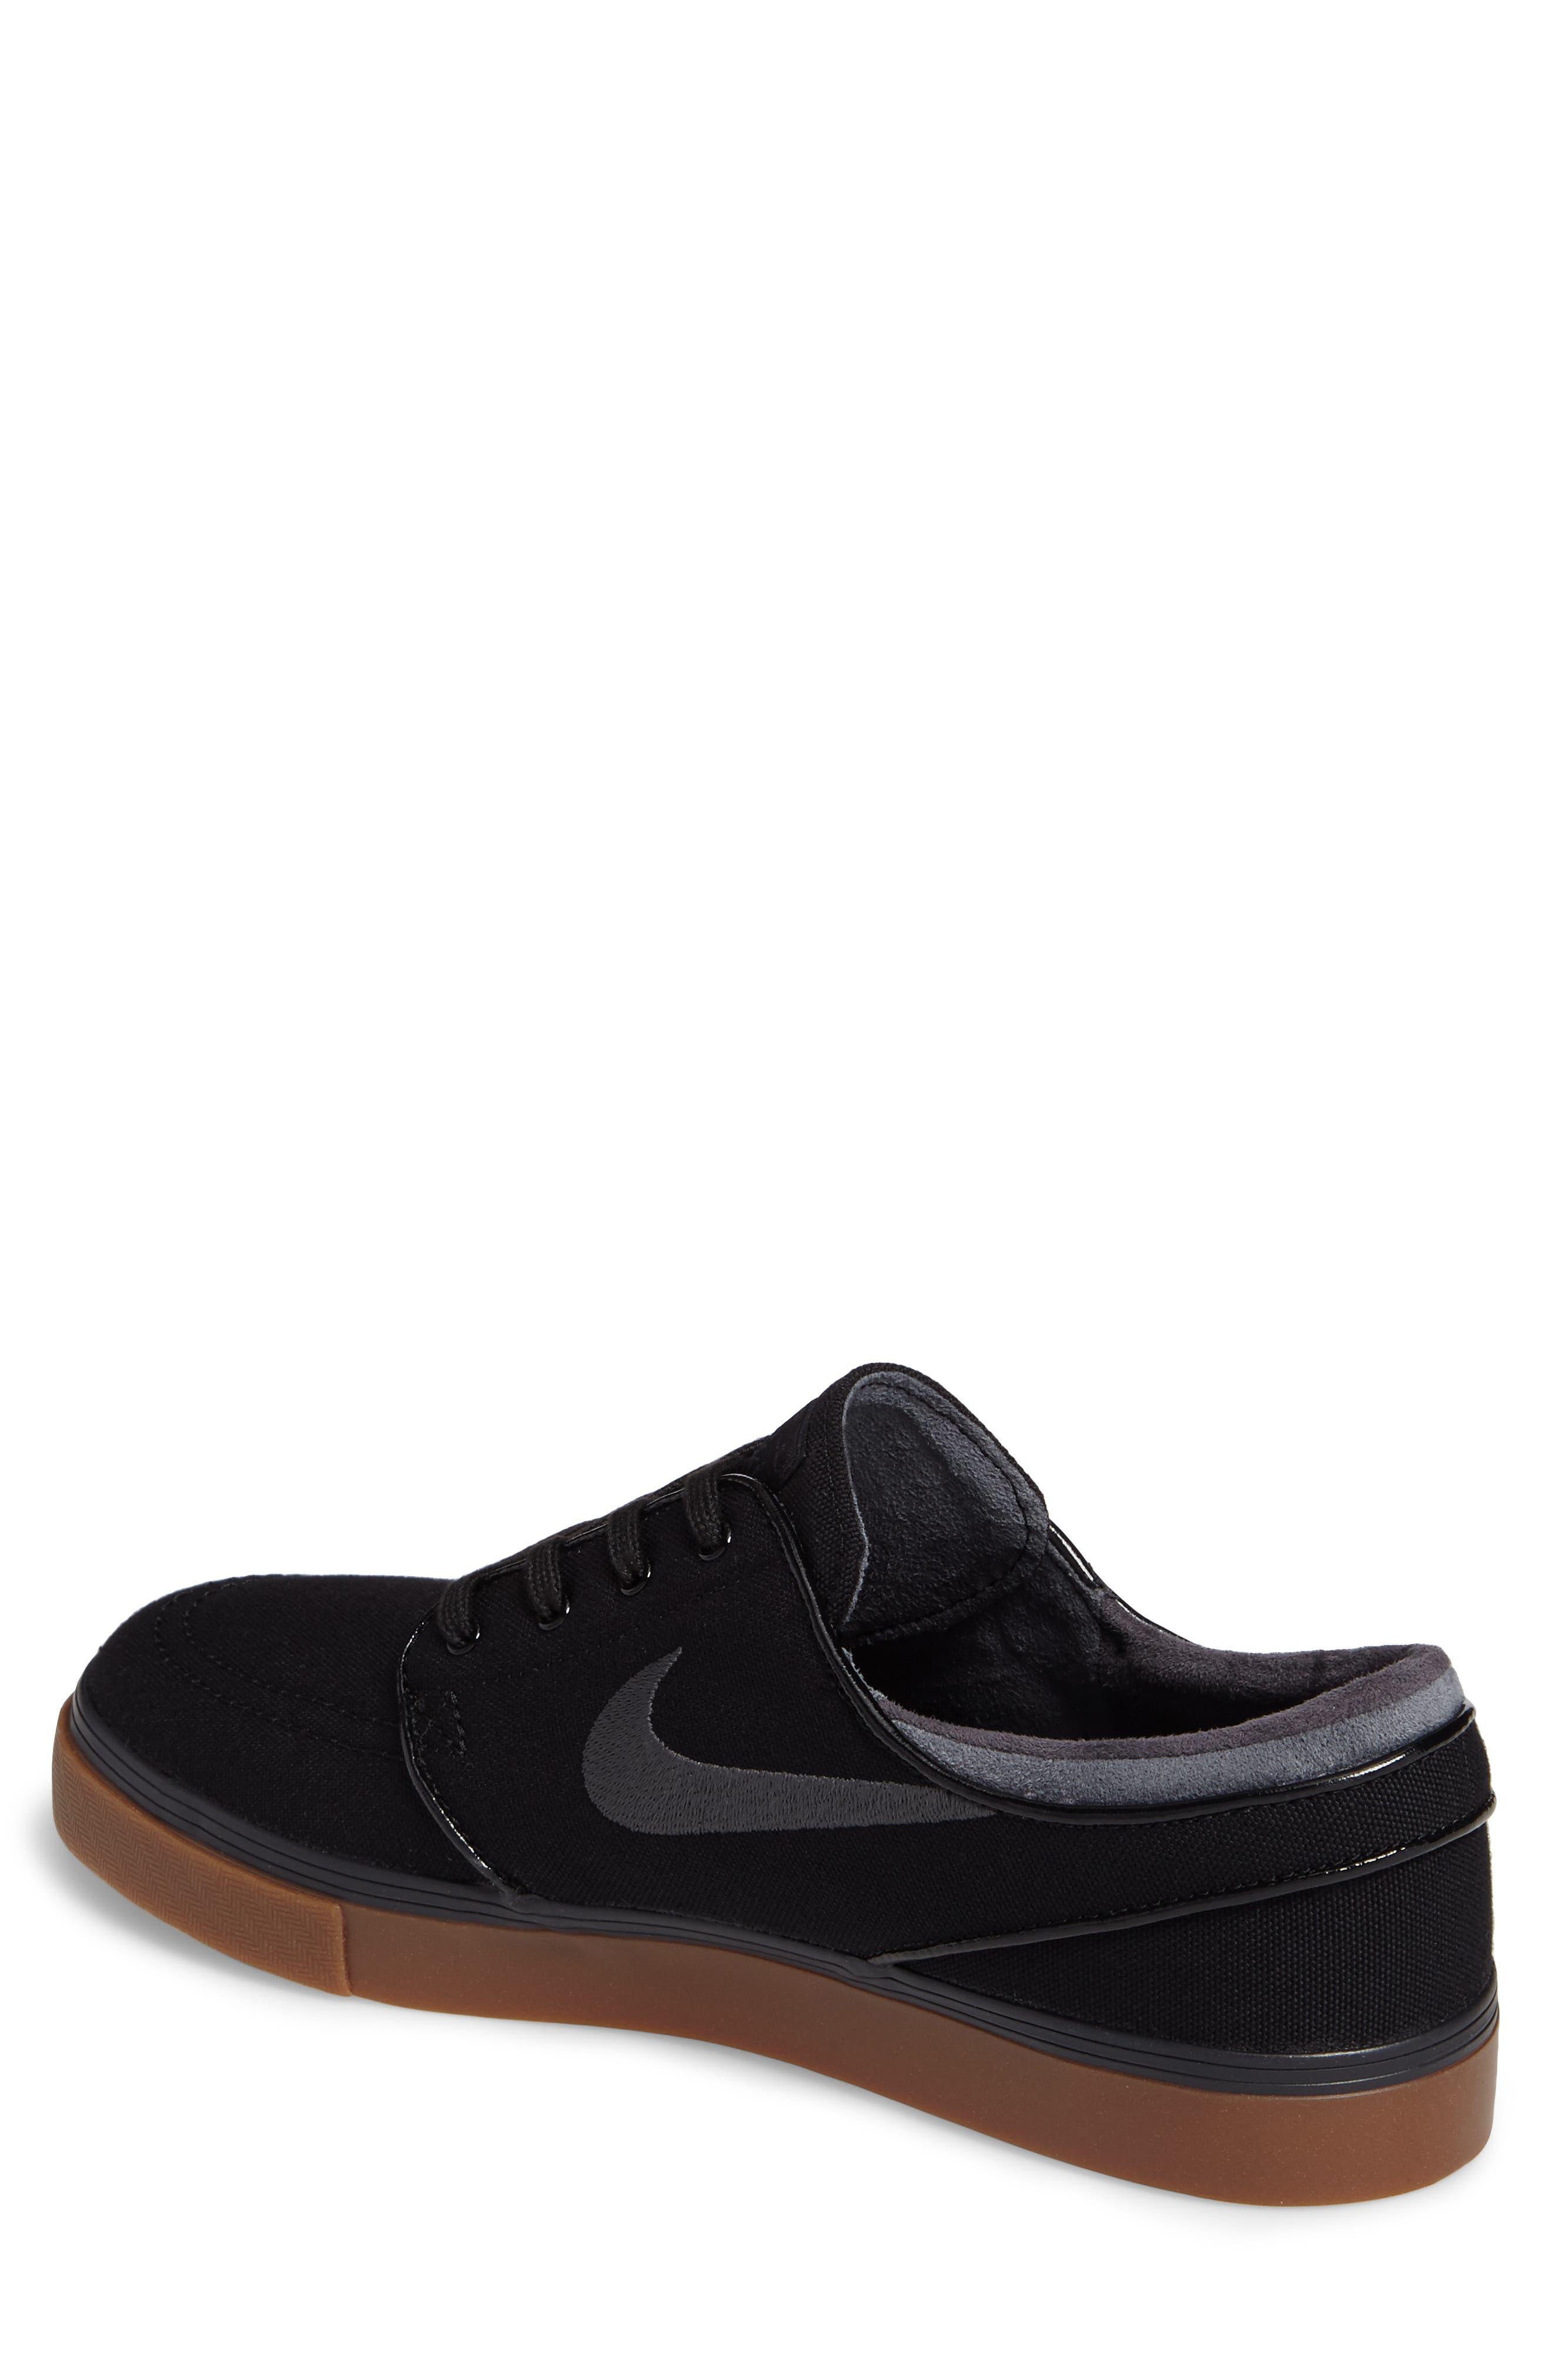 Zoom - Stefan Janoski SB Canvas Skate Shoe,                             Alternate thumbnail 51, color,